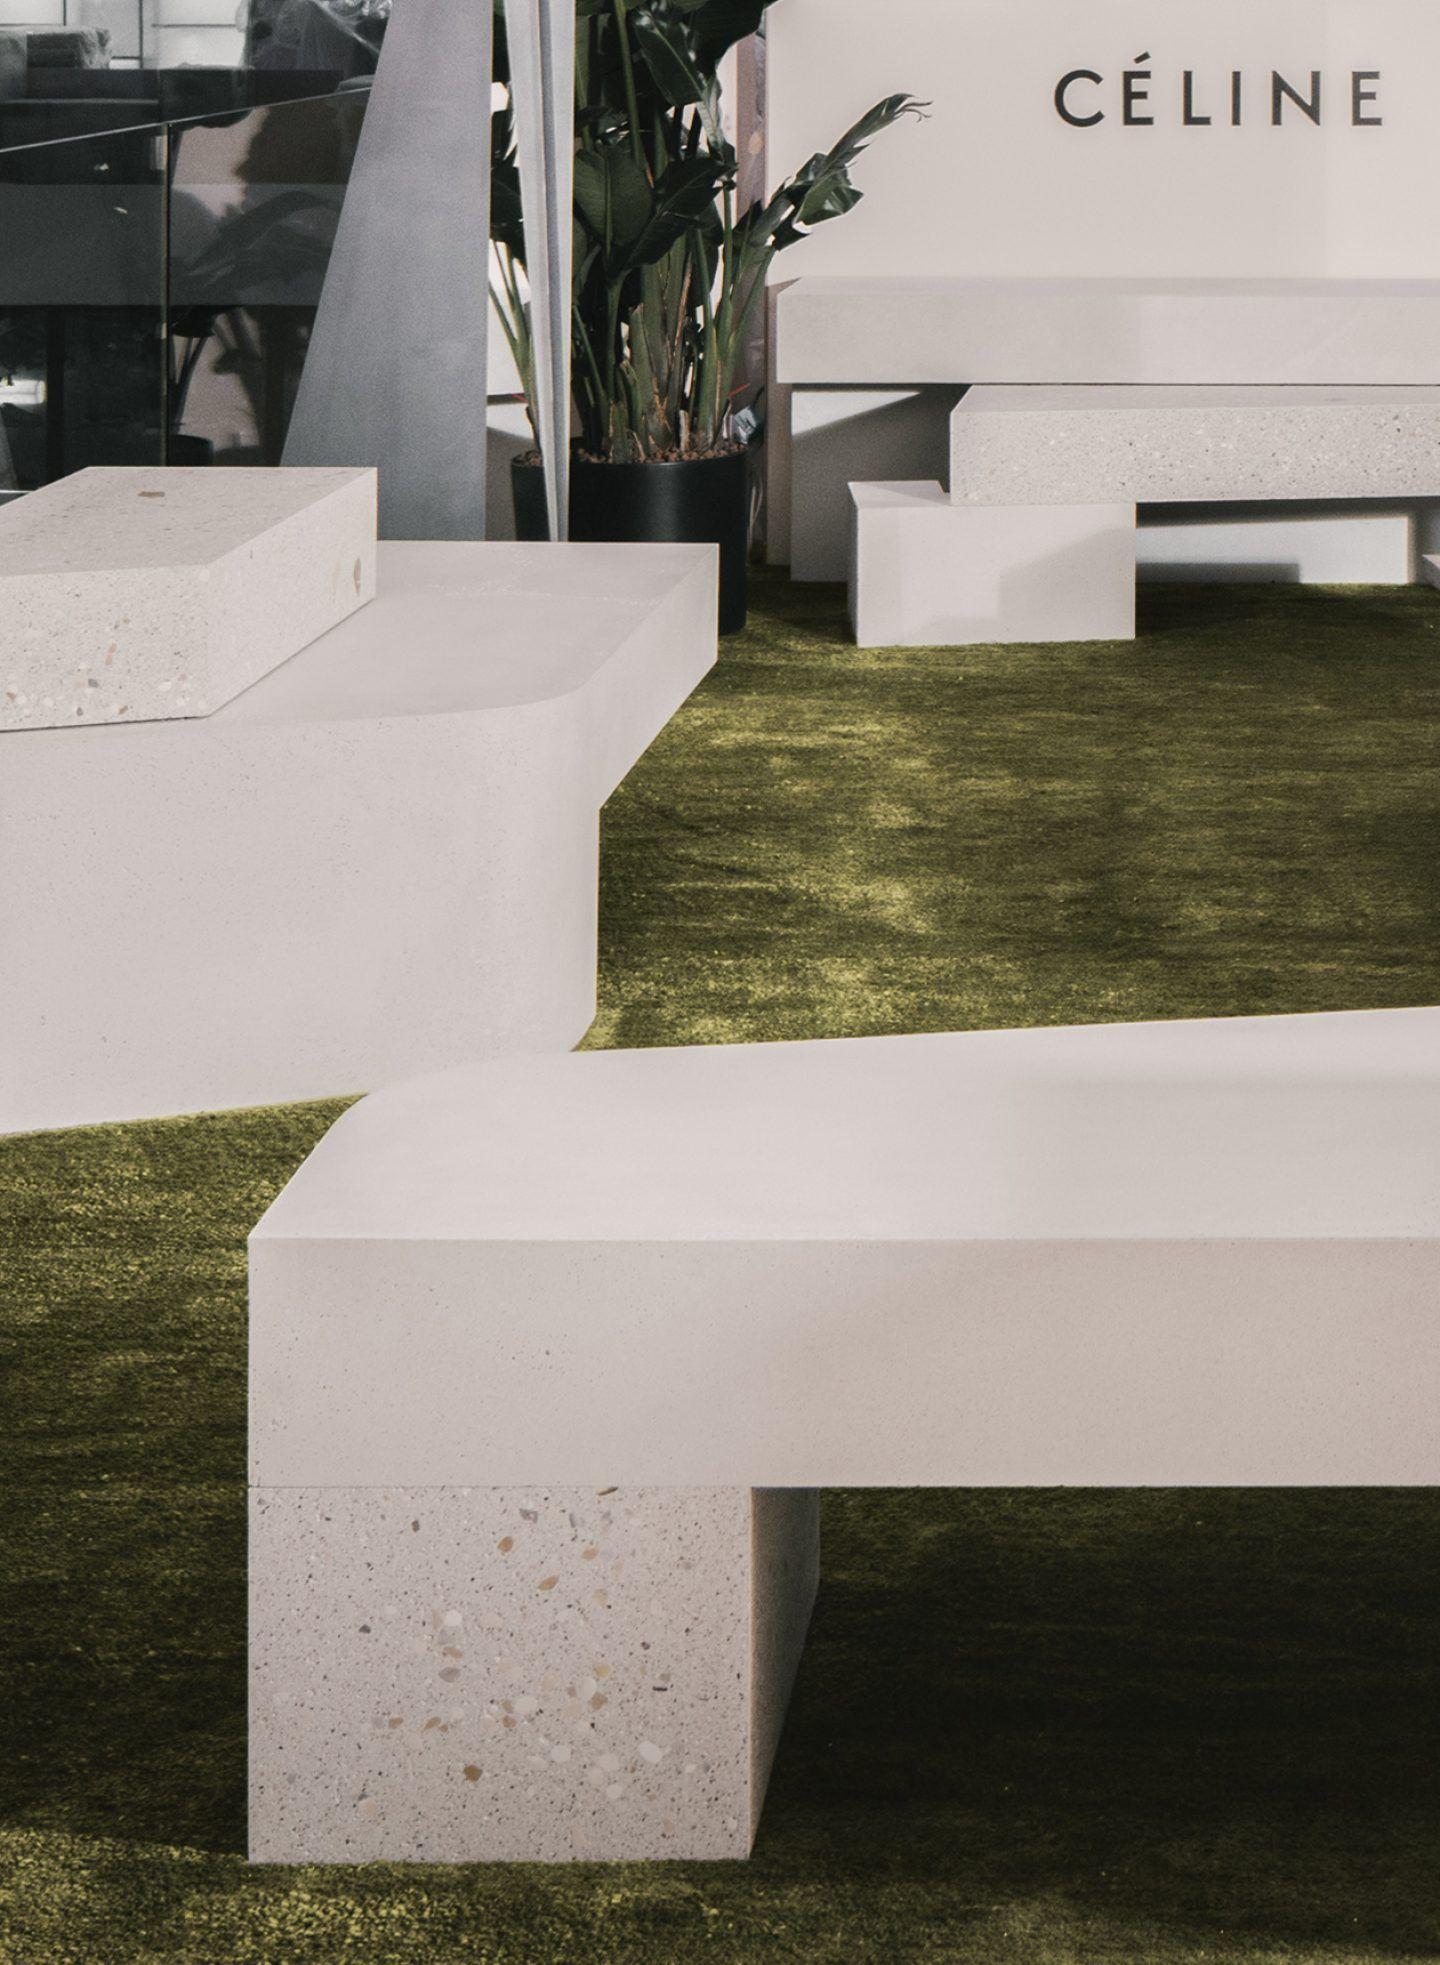 IGNANT-Design-Interior-Al-Jawad-Pike-Celine-Store-14